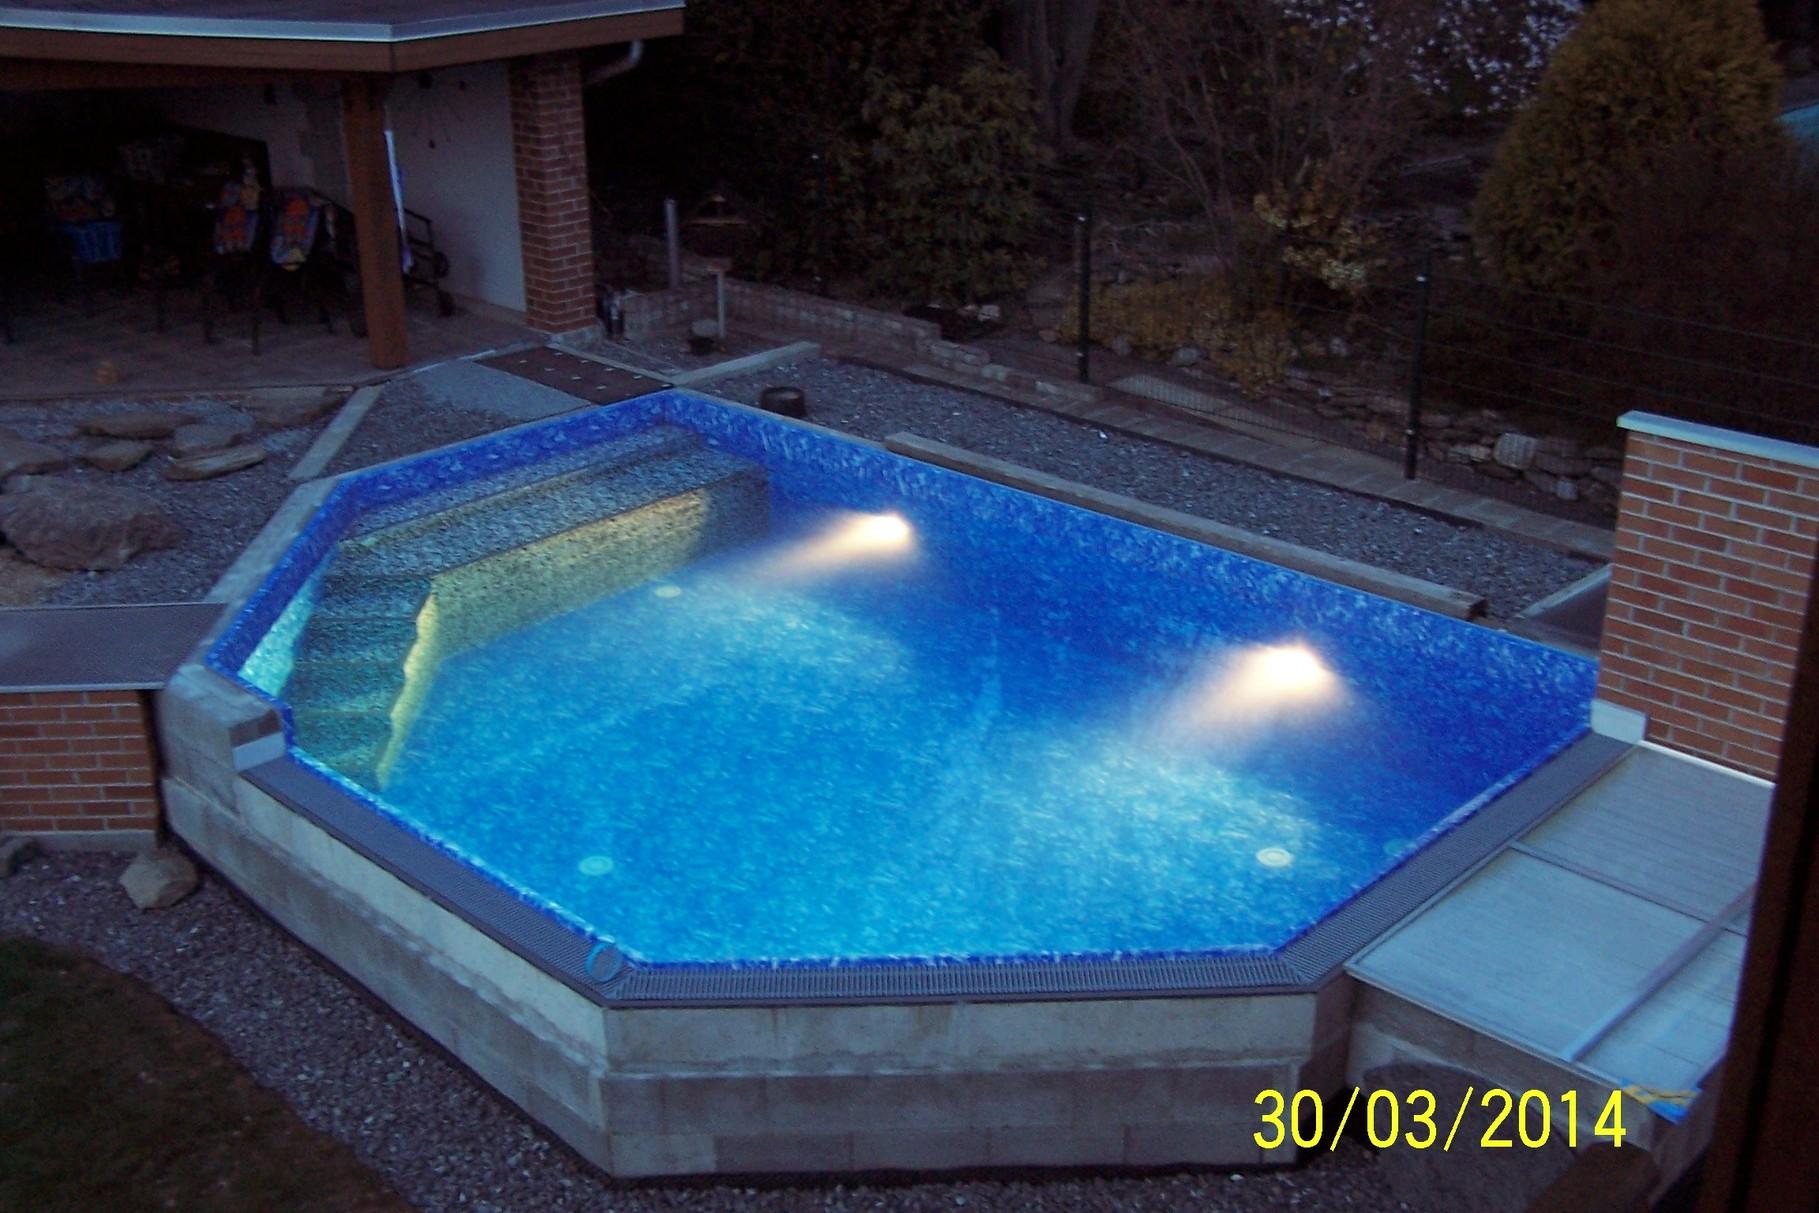 ... Pool Selbst Bauen » Baugrube Poolselbstgebaut. Baugrube    Poolselbstgebaut